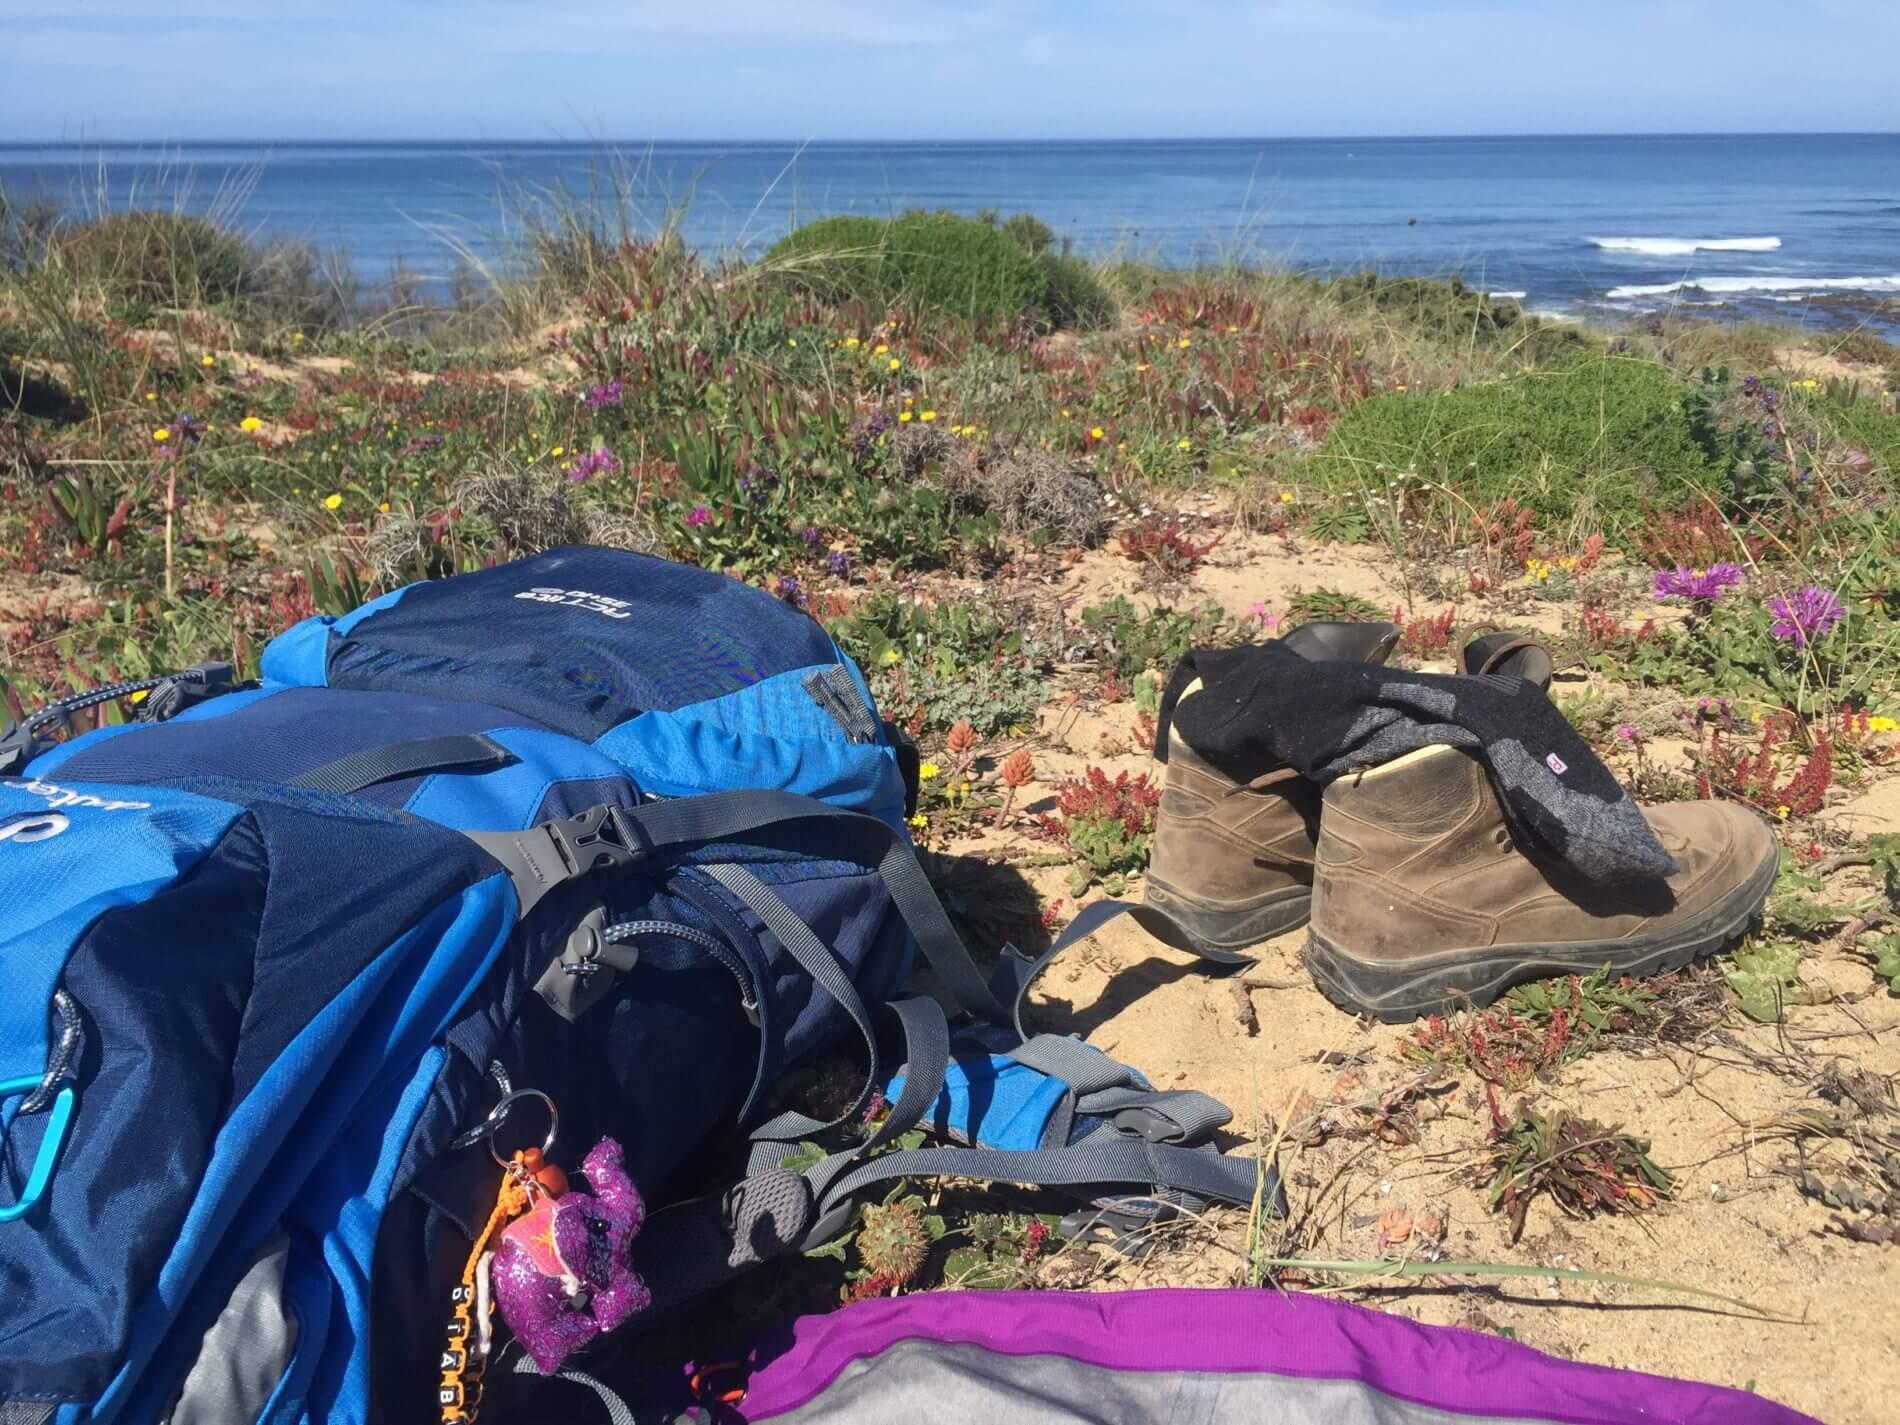 Rota Vicentina_Fishermen's Trail_Pausenensemble mit Rucksack und Wandersteifeln am Atlantik